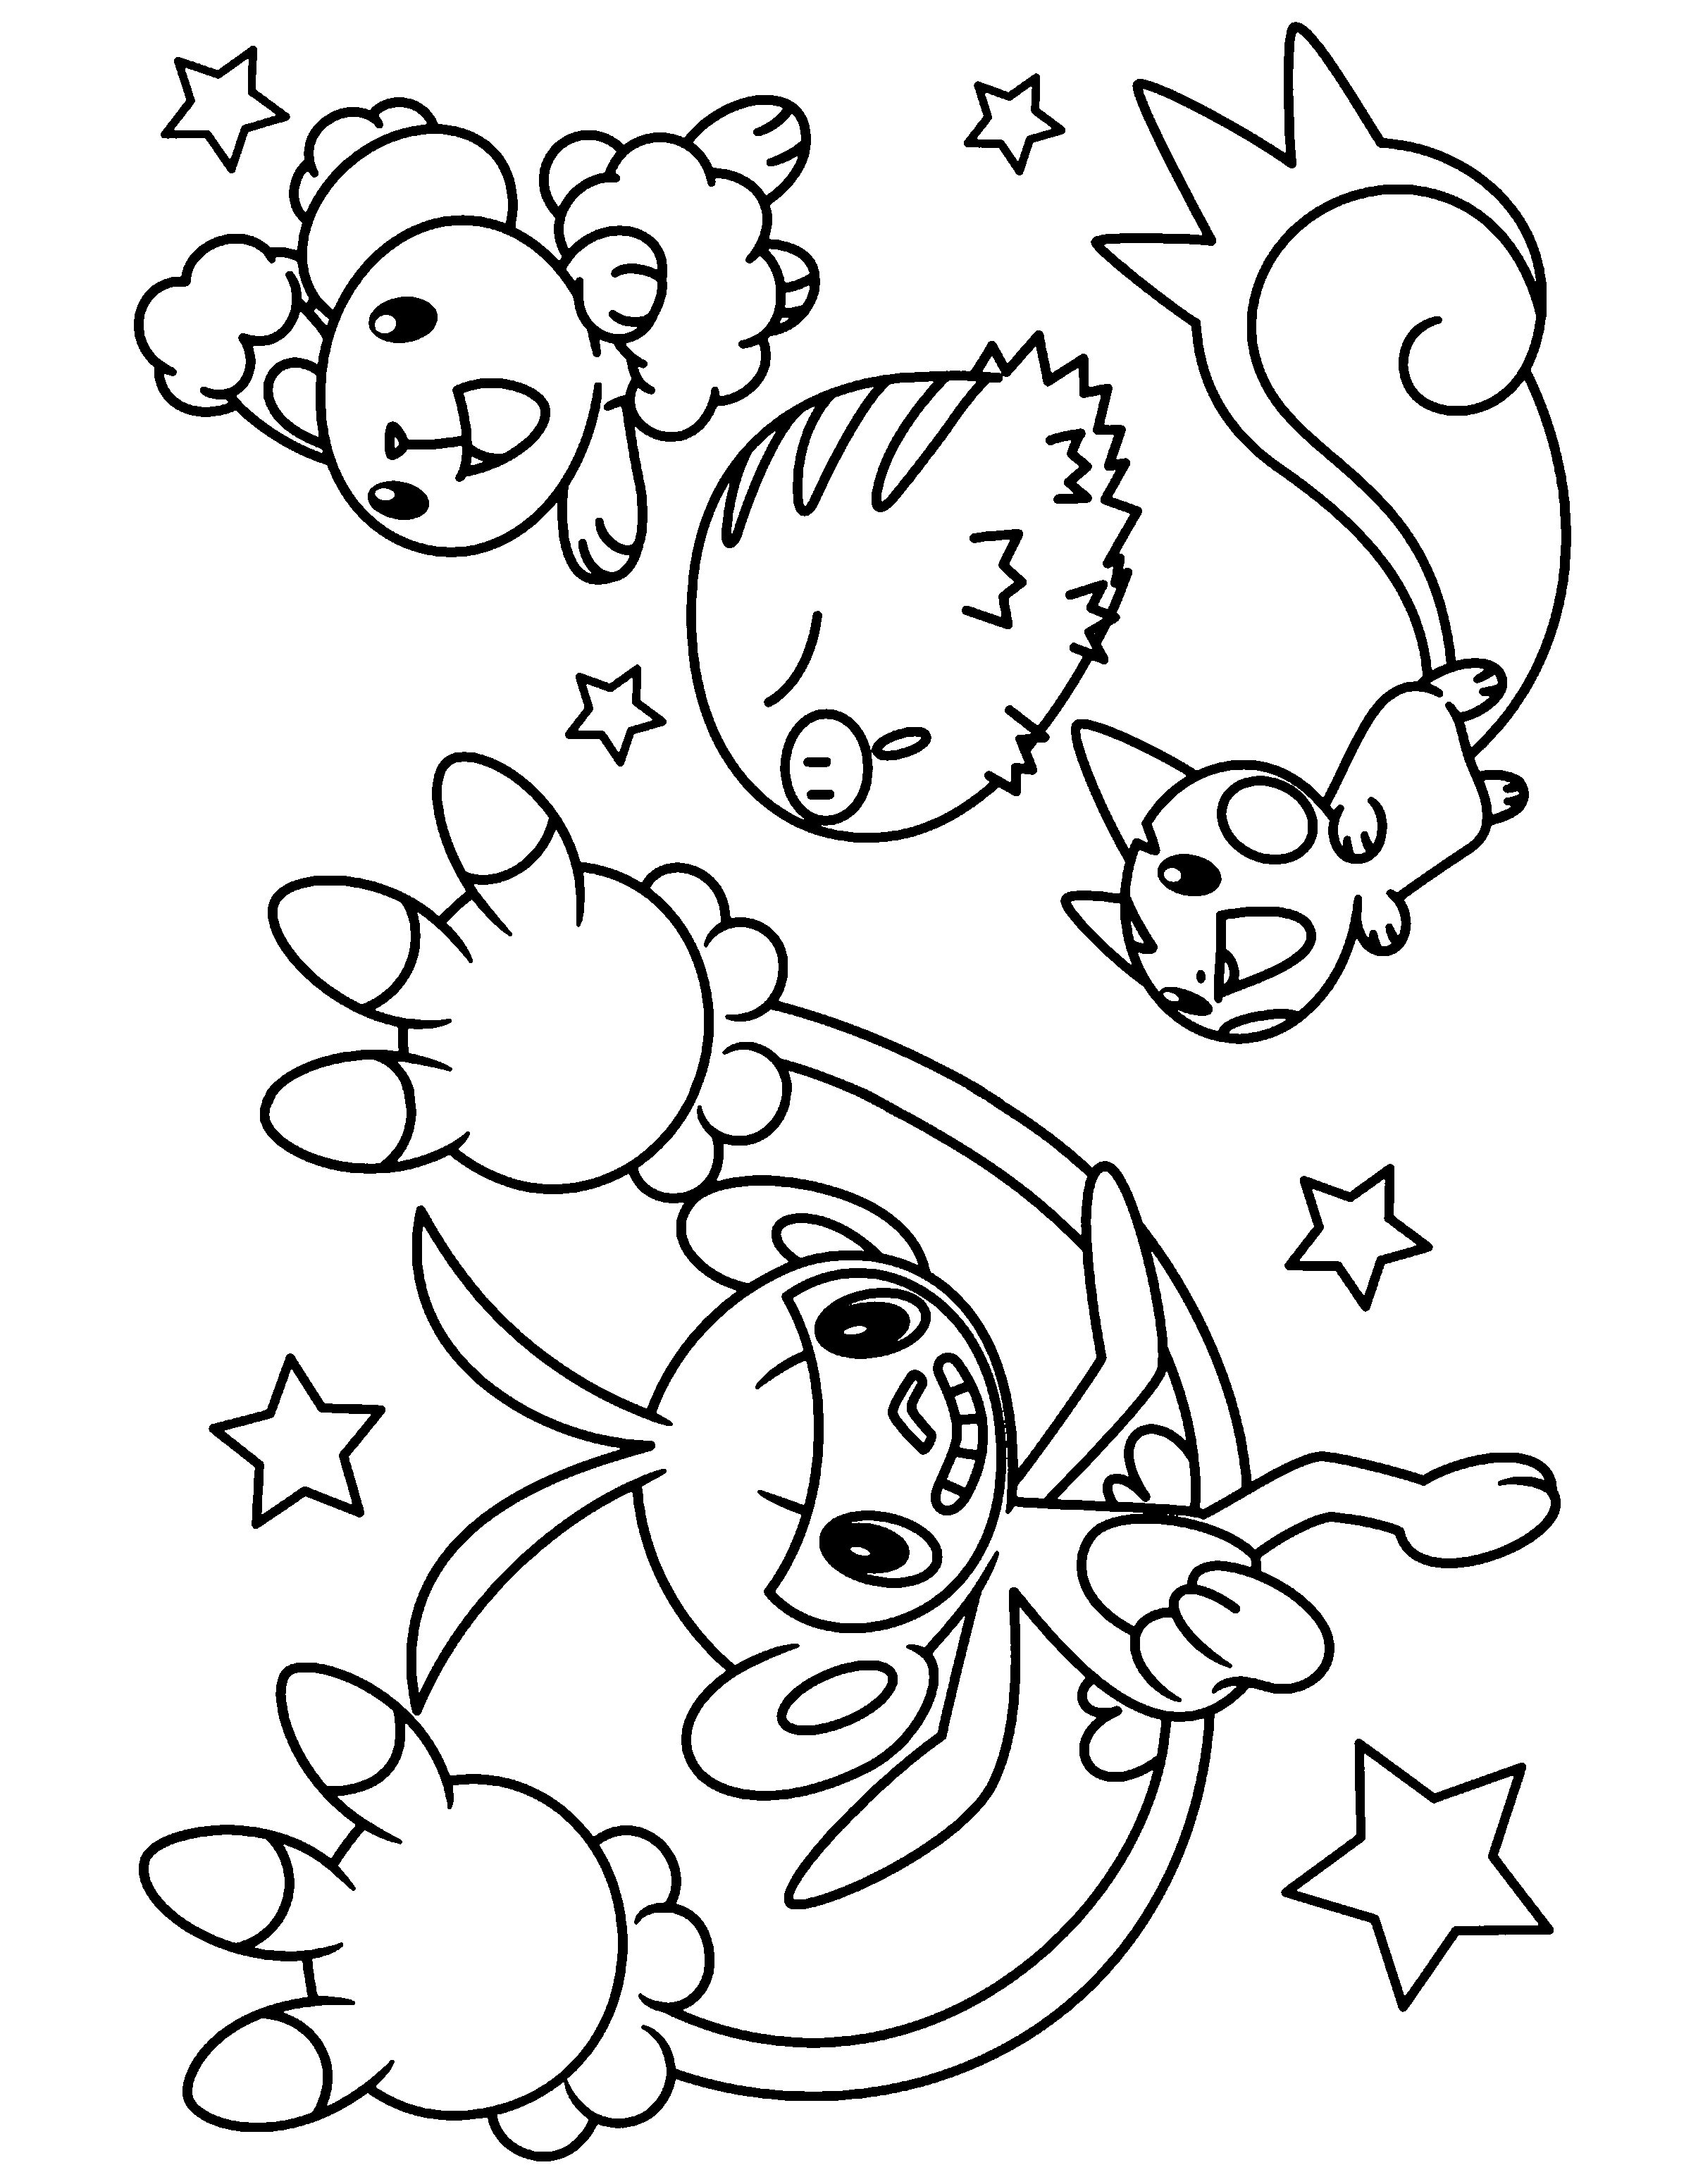 Pokemon diamond pearl Coloring Pages - Coloringpages1001.com